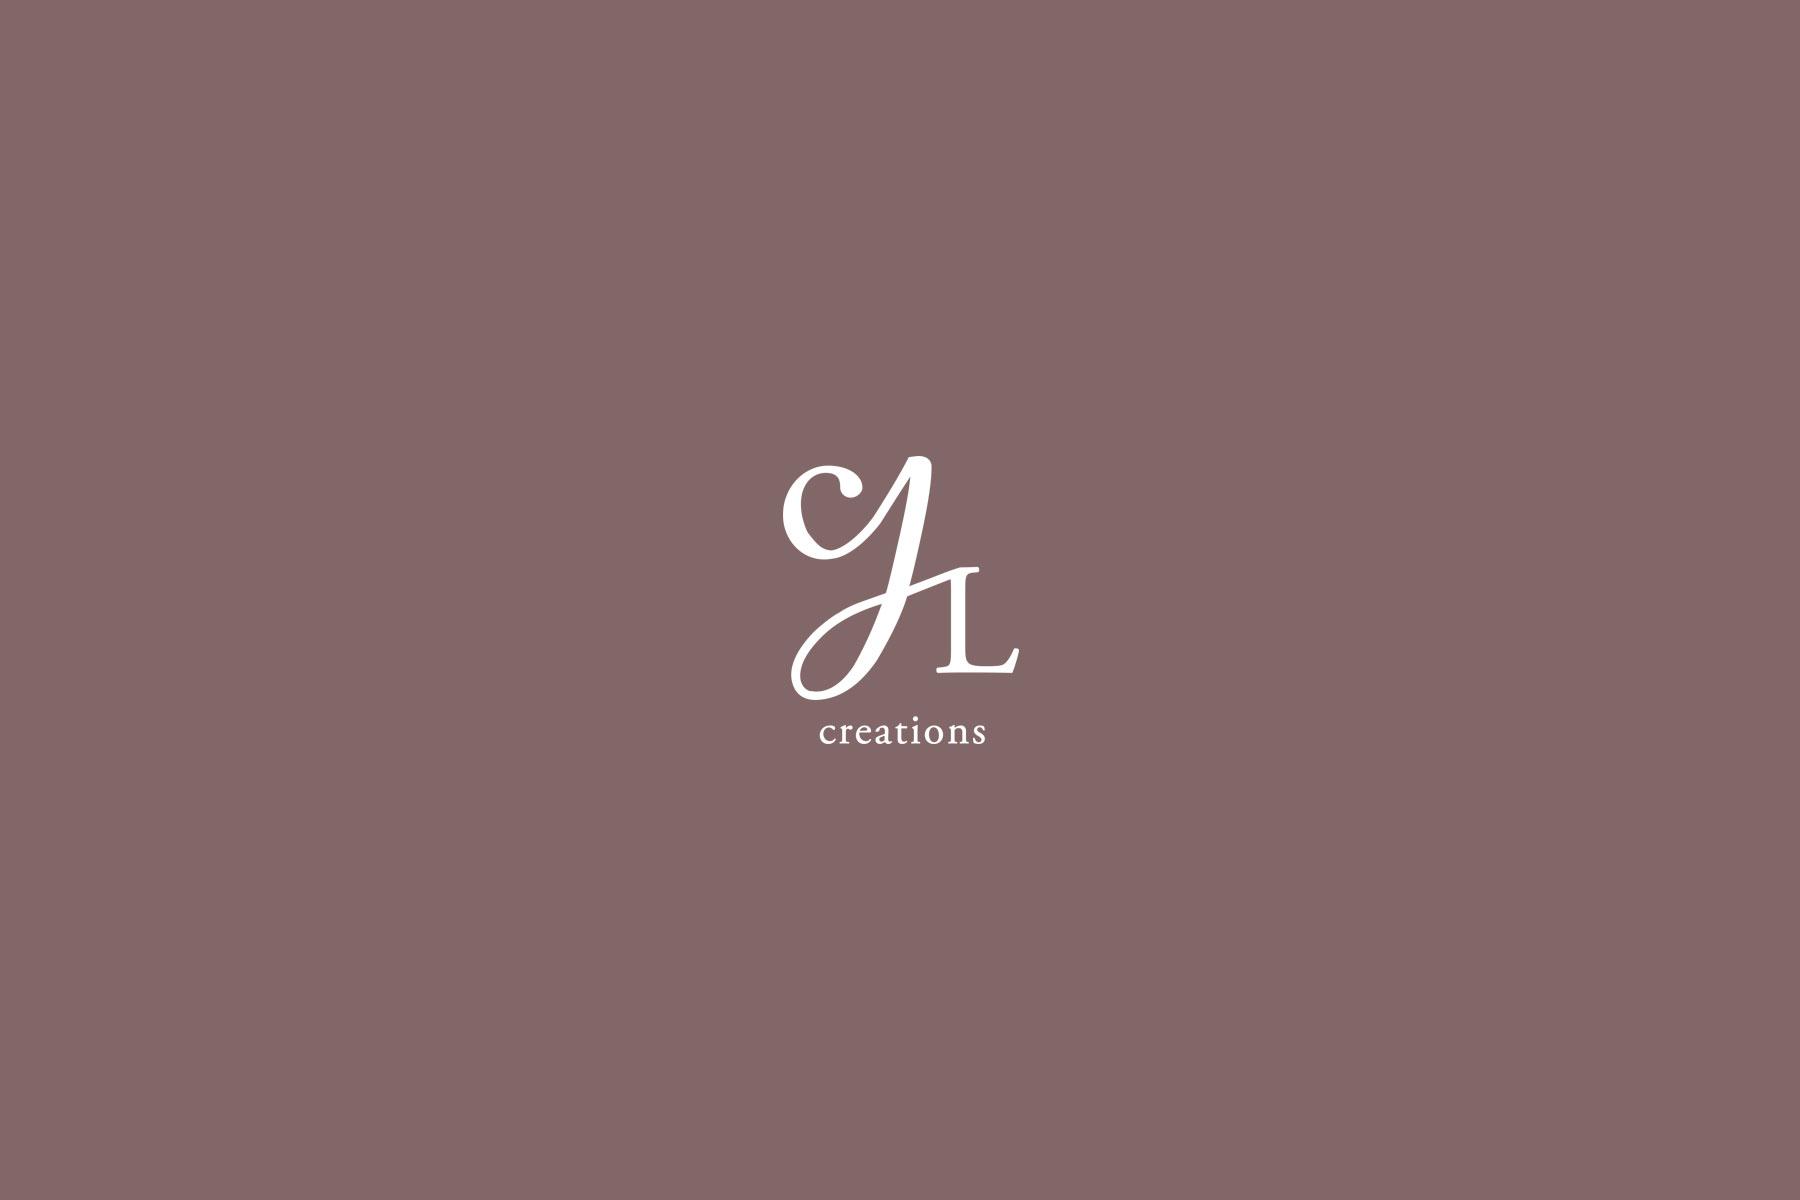 cjl-creations-portfolio-logo.jpg